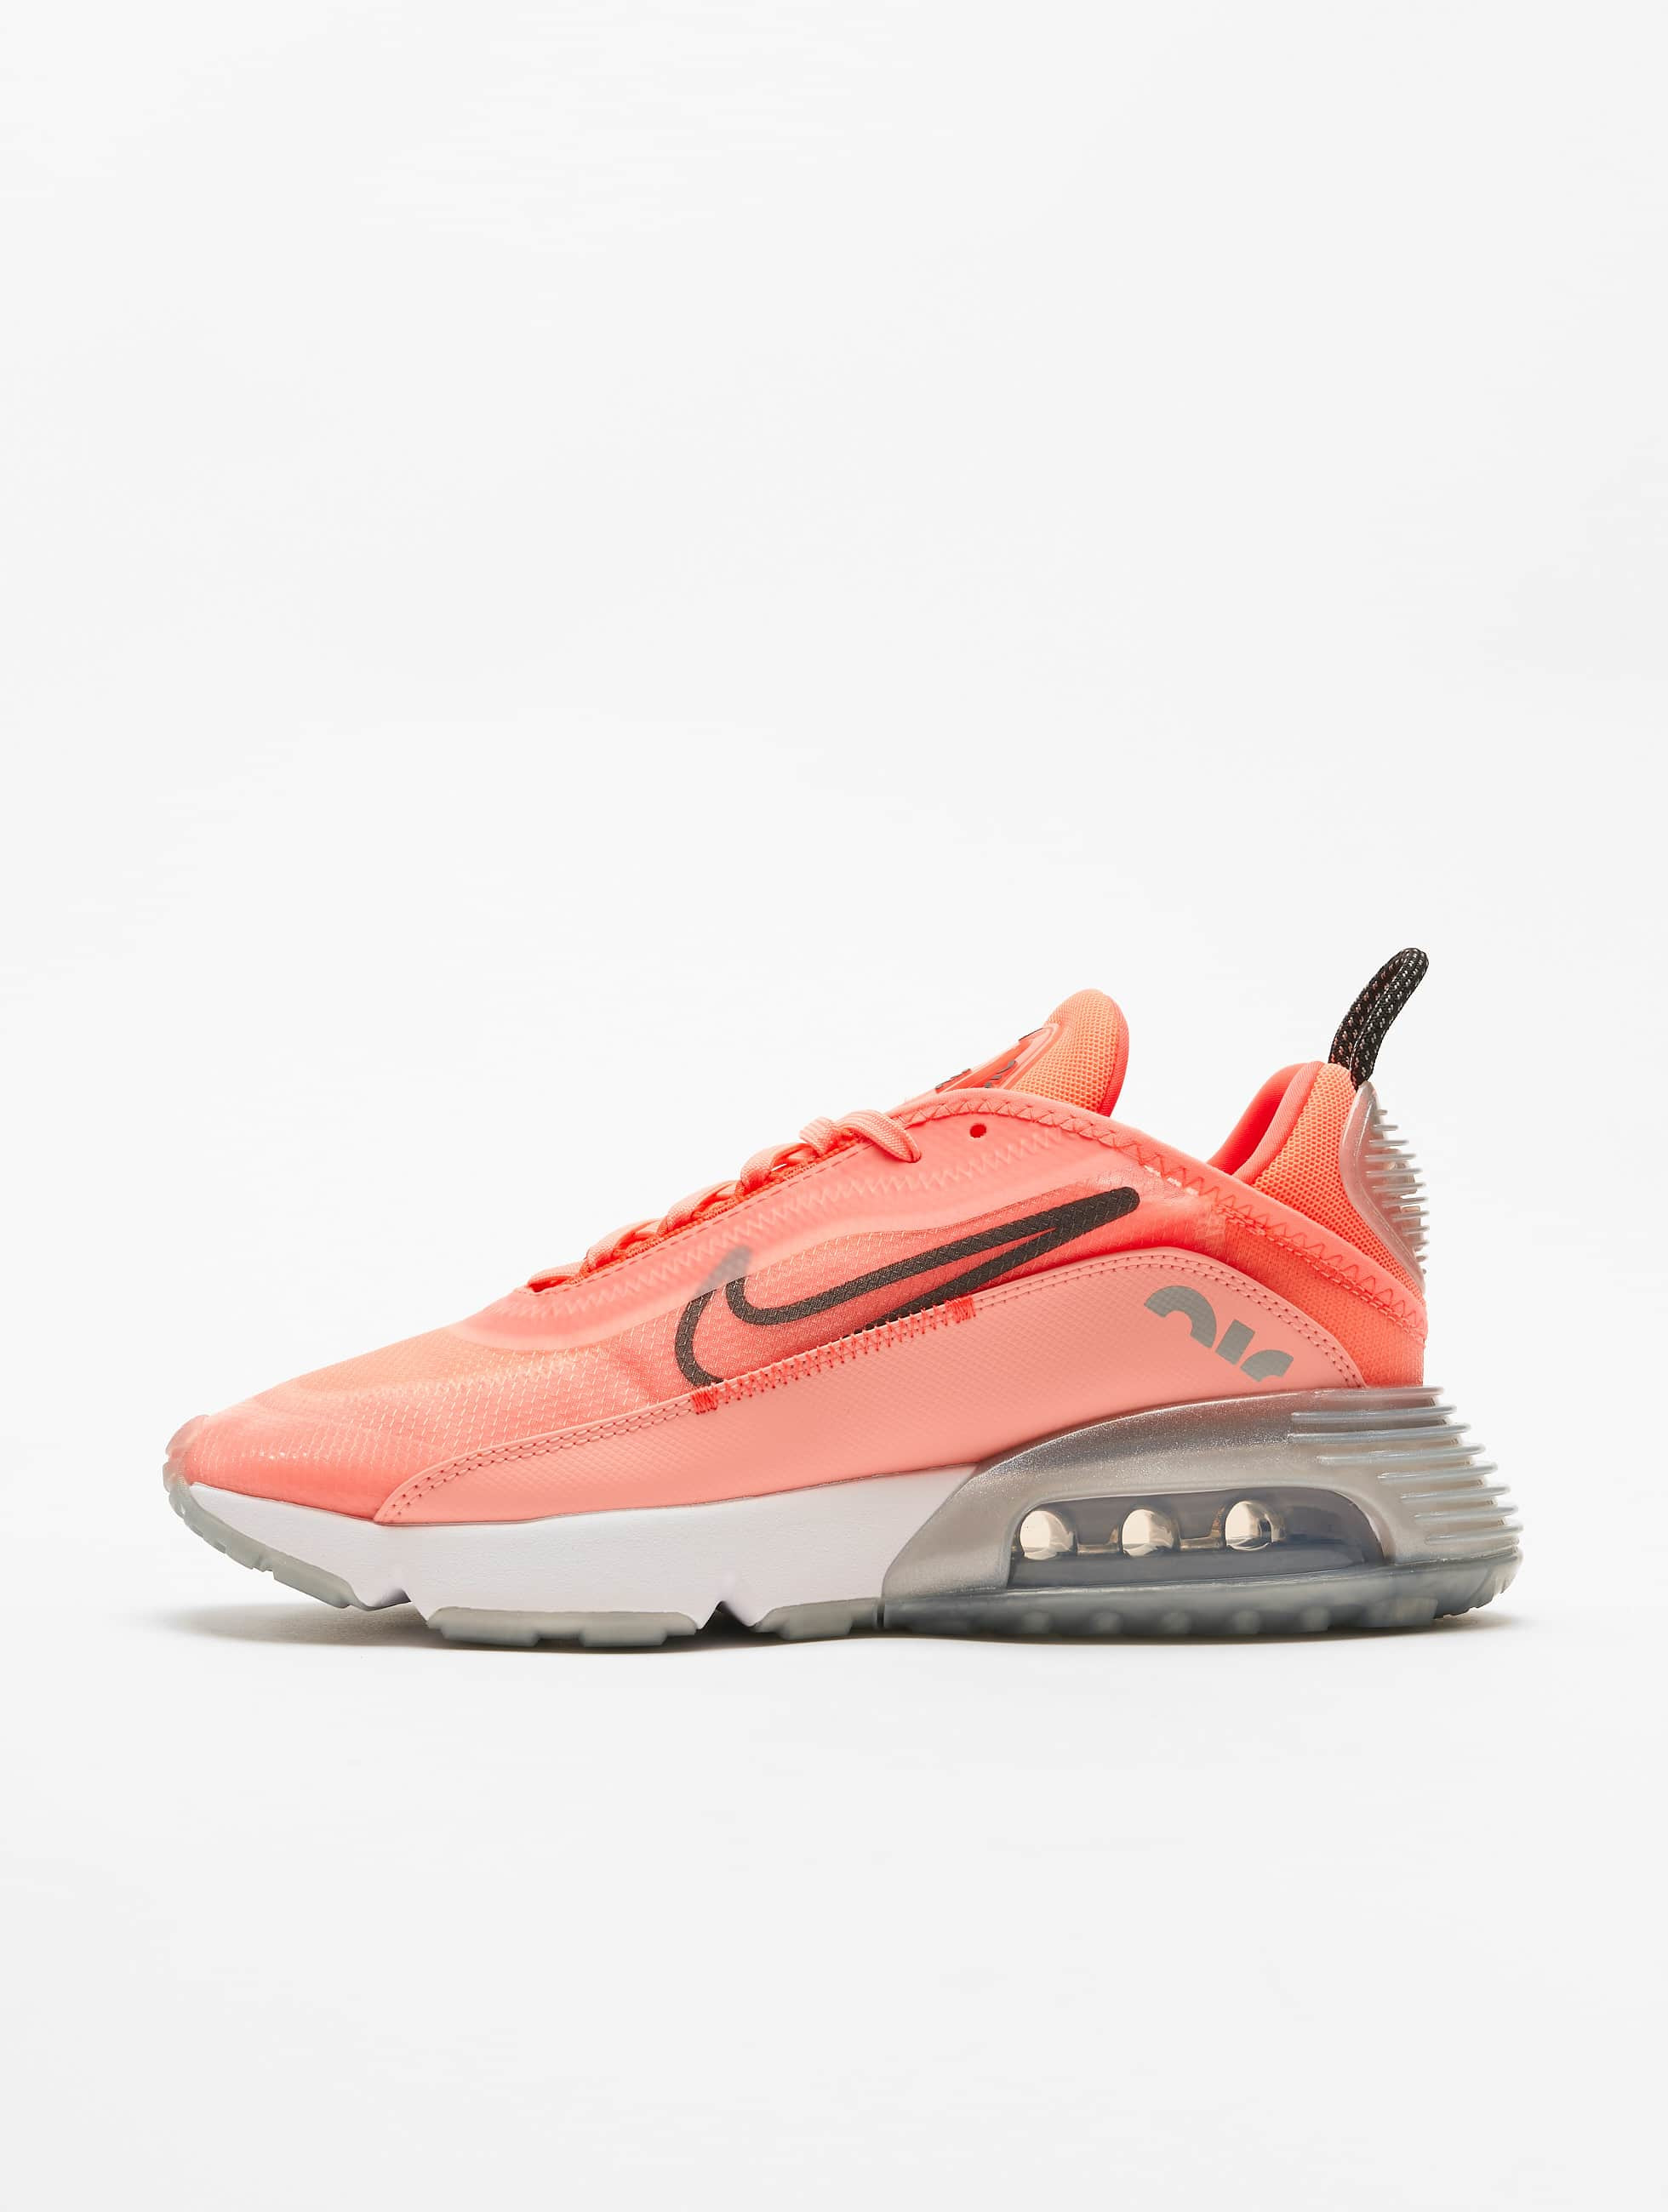 Nike W Air Max 2090 Sneakers Lava GlowBlackFlash Crimson